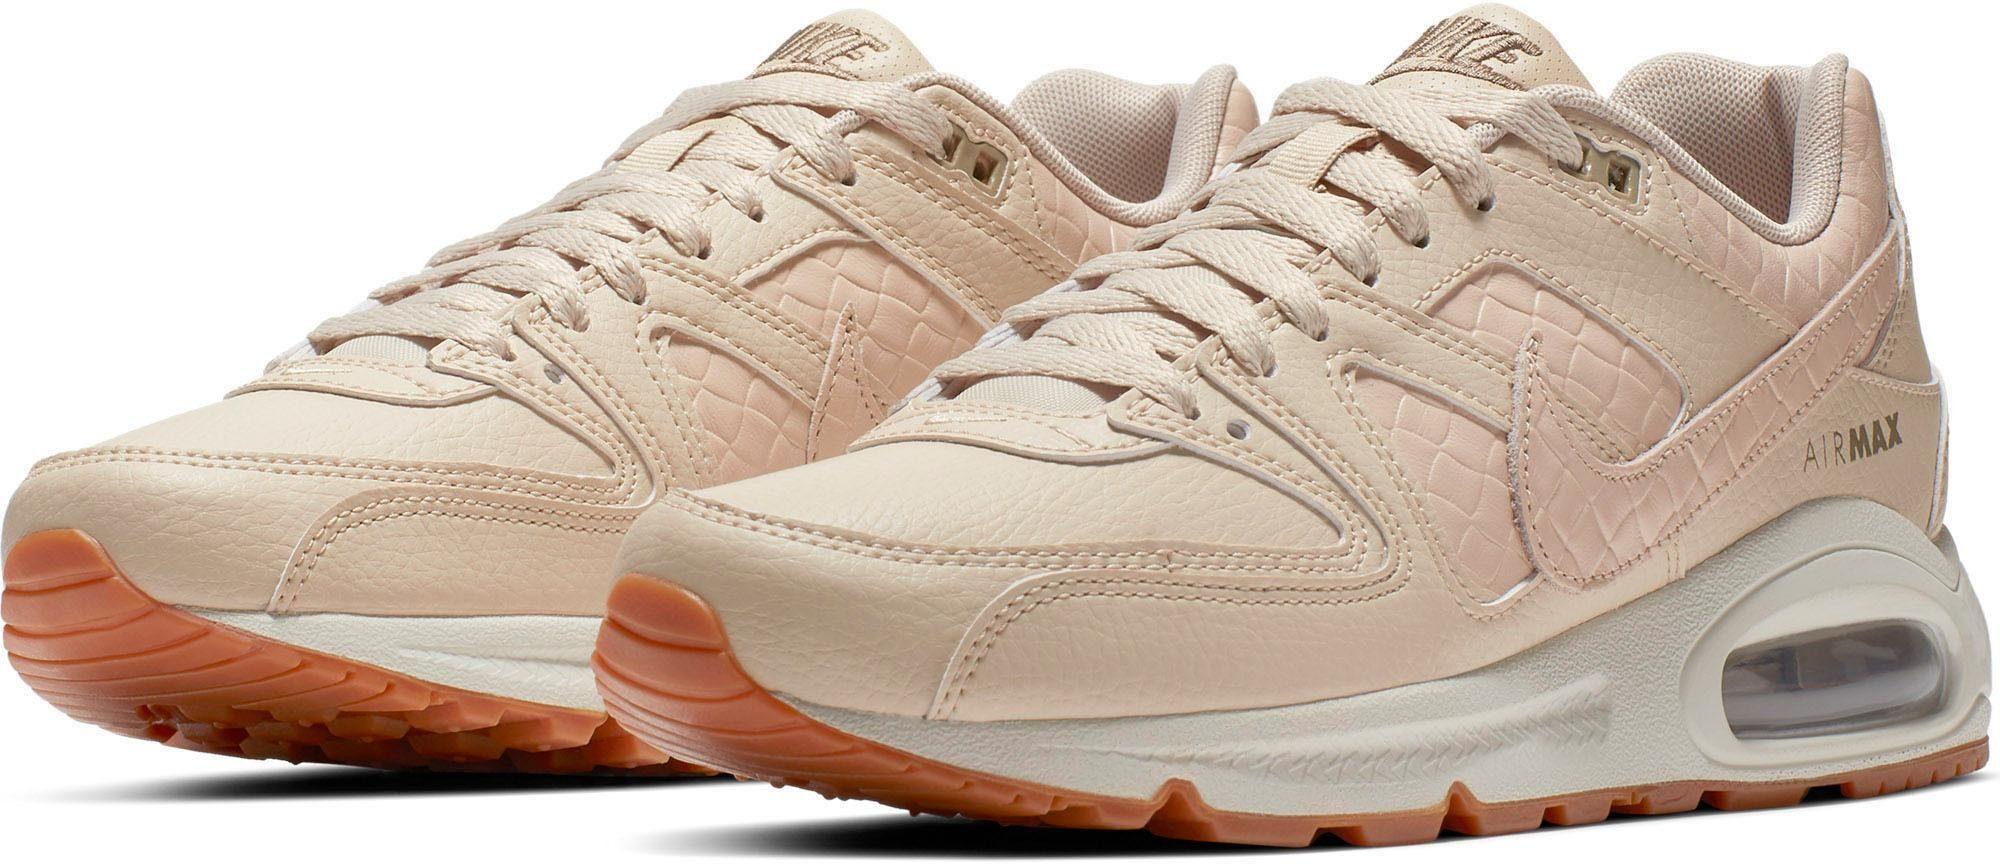 Nike Sportswear »Wmns Air Max Command Premium« Sneaker online kaufen | OTTO